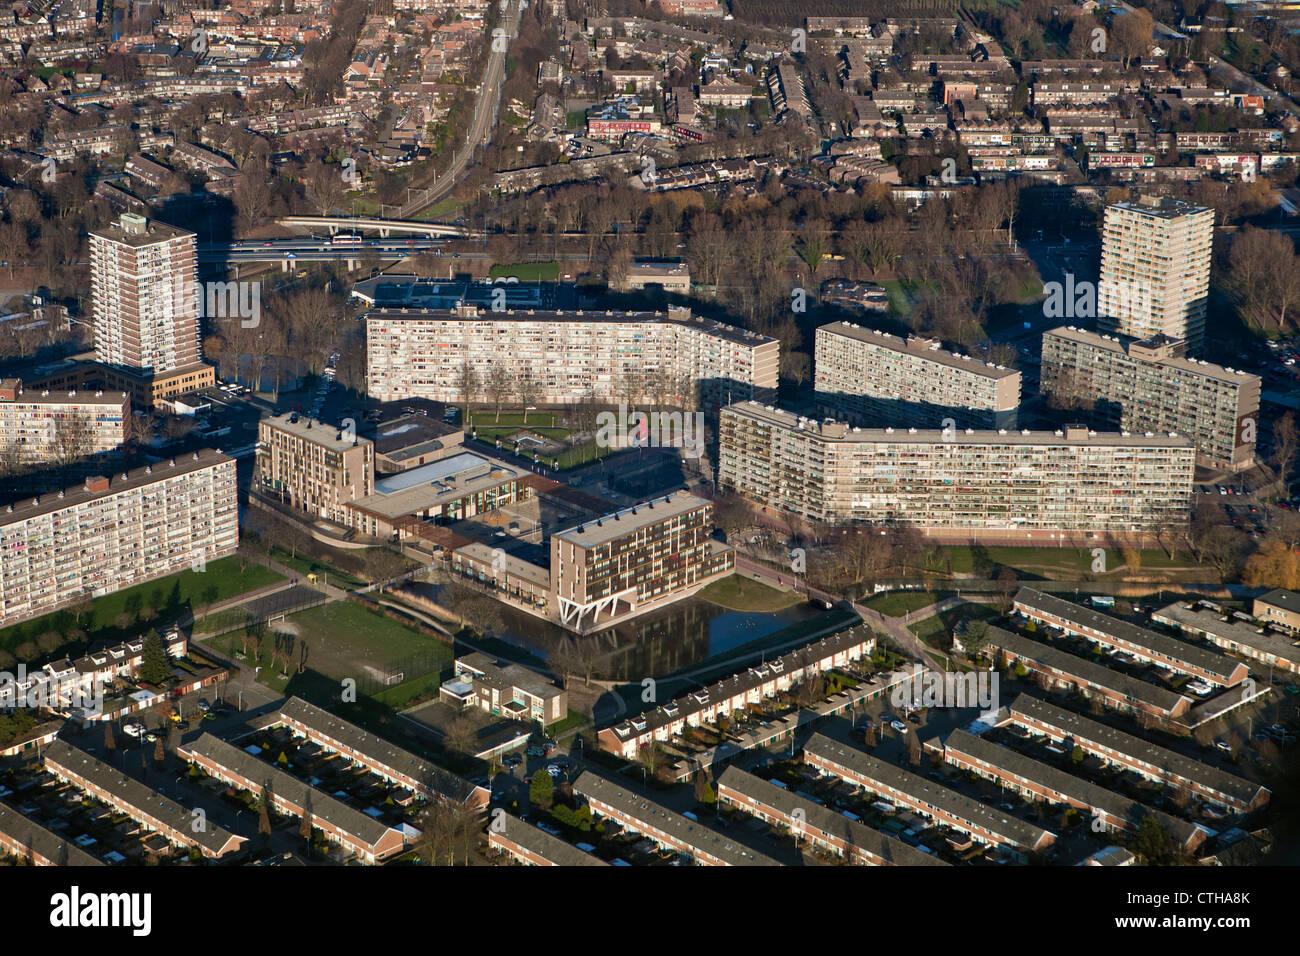 I Paesi Bassi, Zoetermeer, città. Antenna. Edifici di appartamenti. Immagini Stock